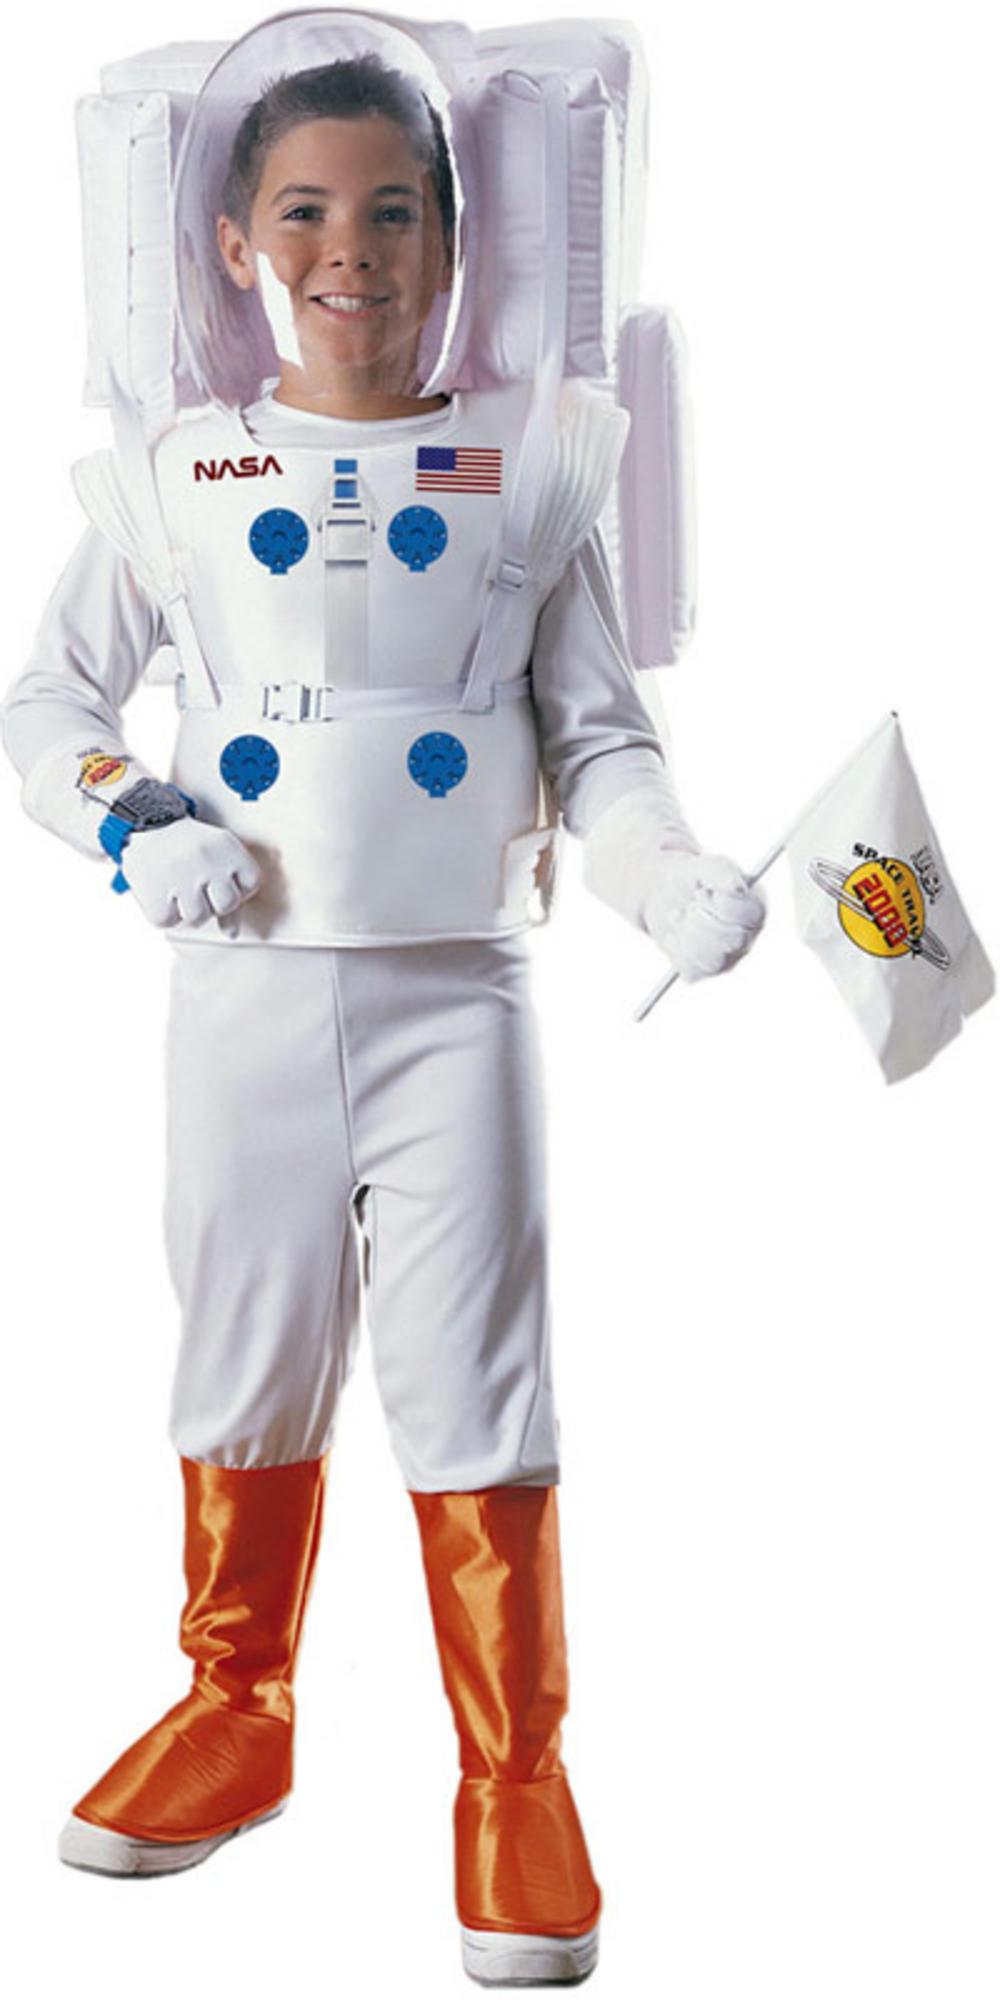 NASA Jr. Astronaut Suit - Costume